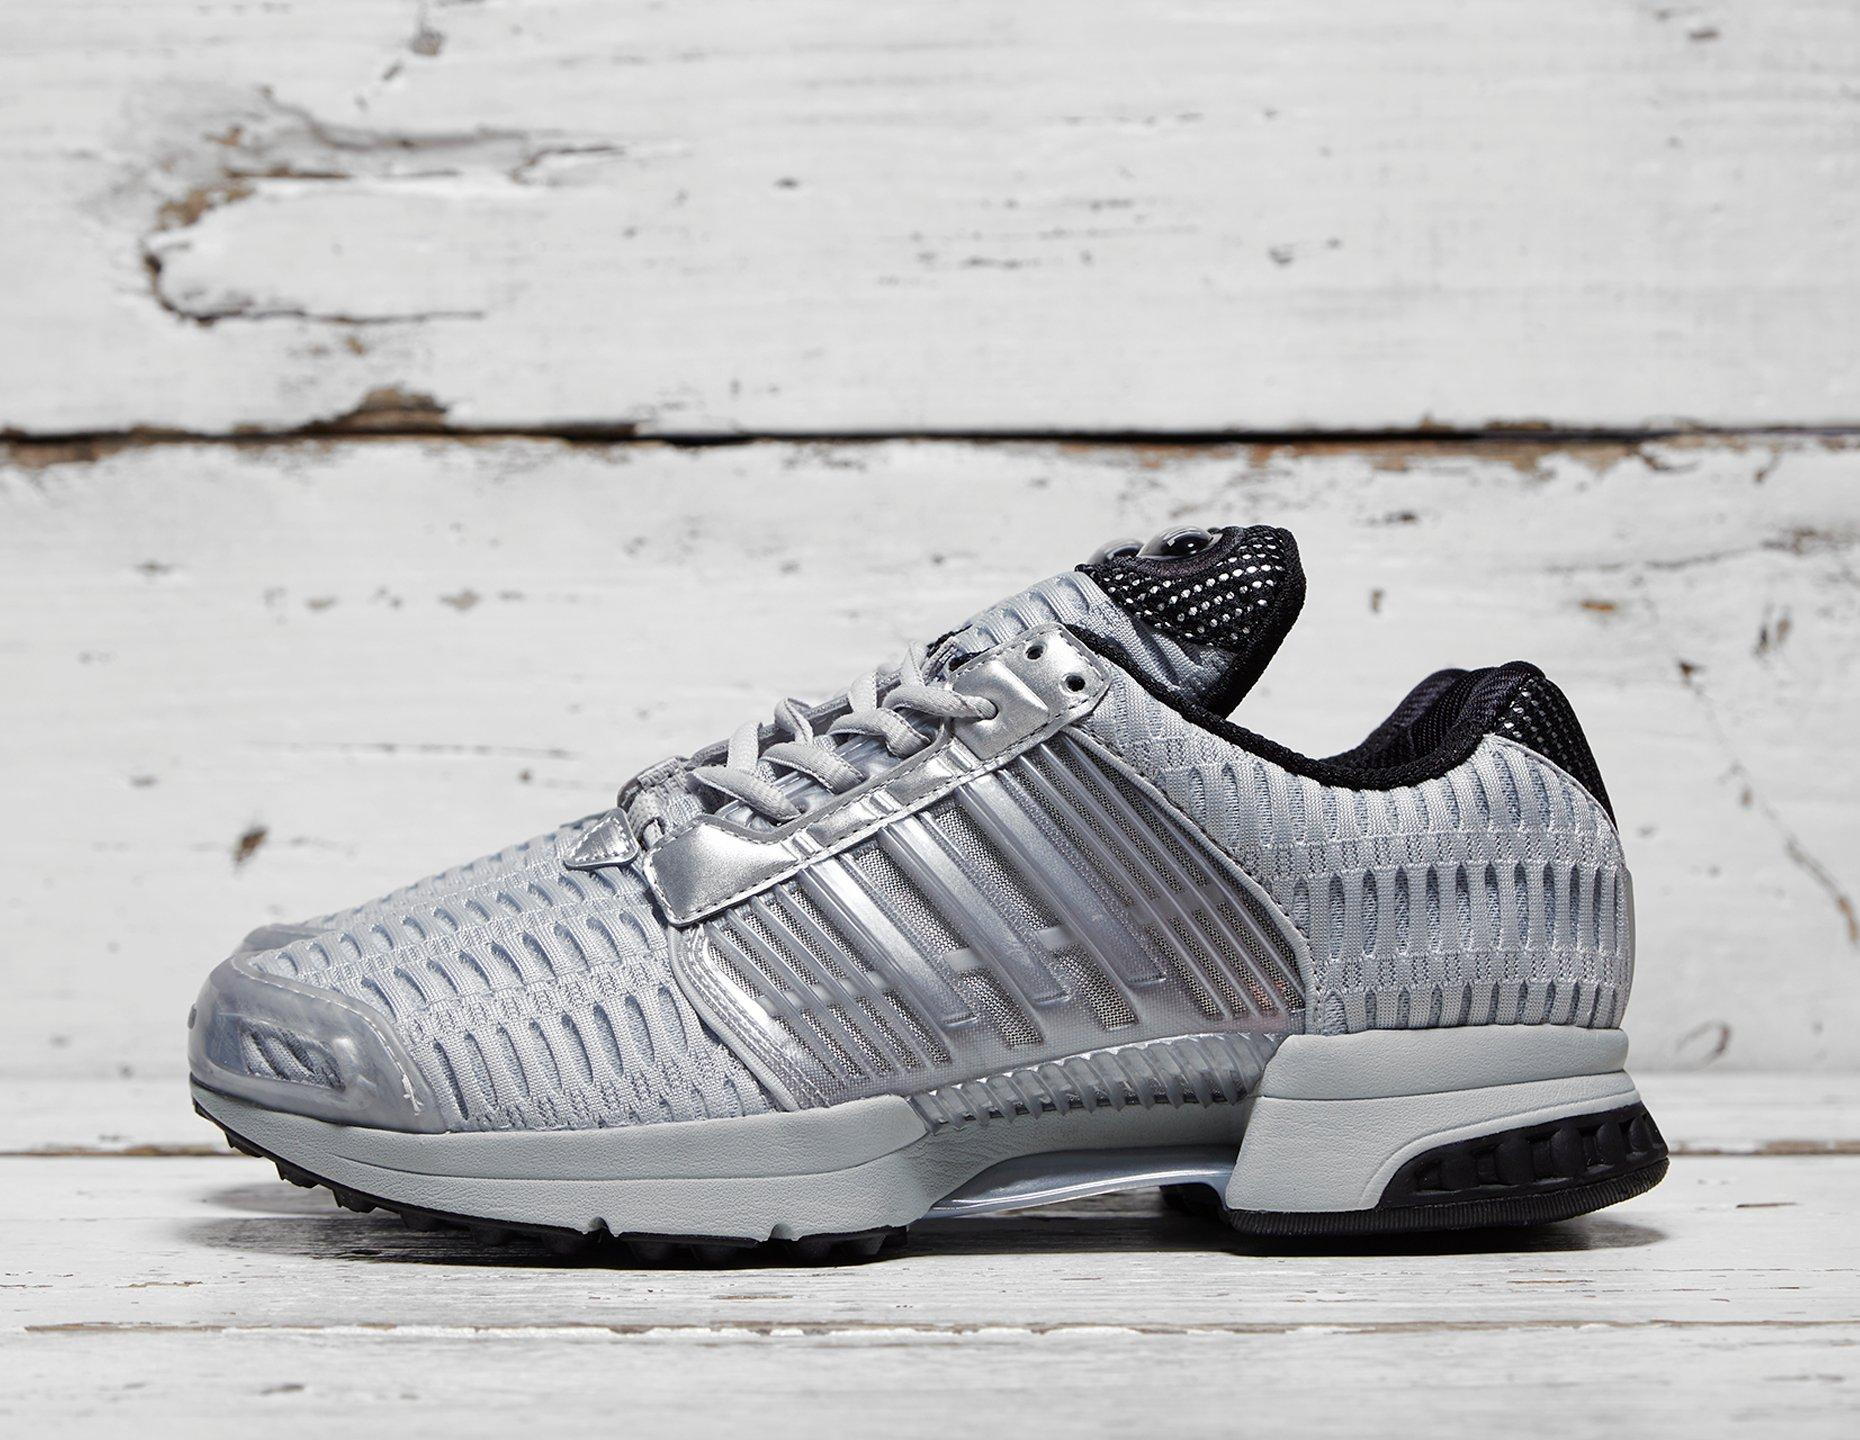 Mens adidas Originals Climacool 1 'Precious Metals' - Silver, Silver - photo 1/1